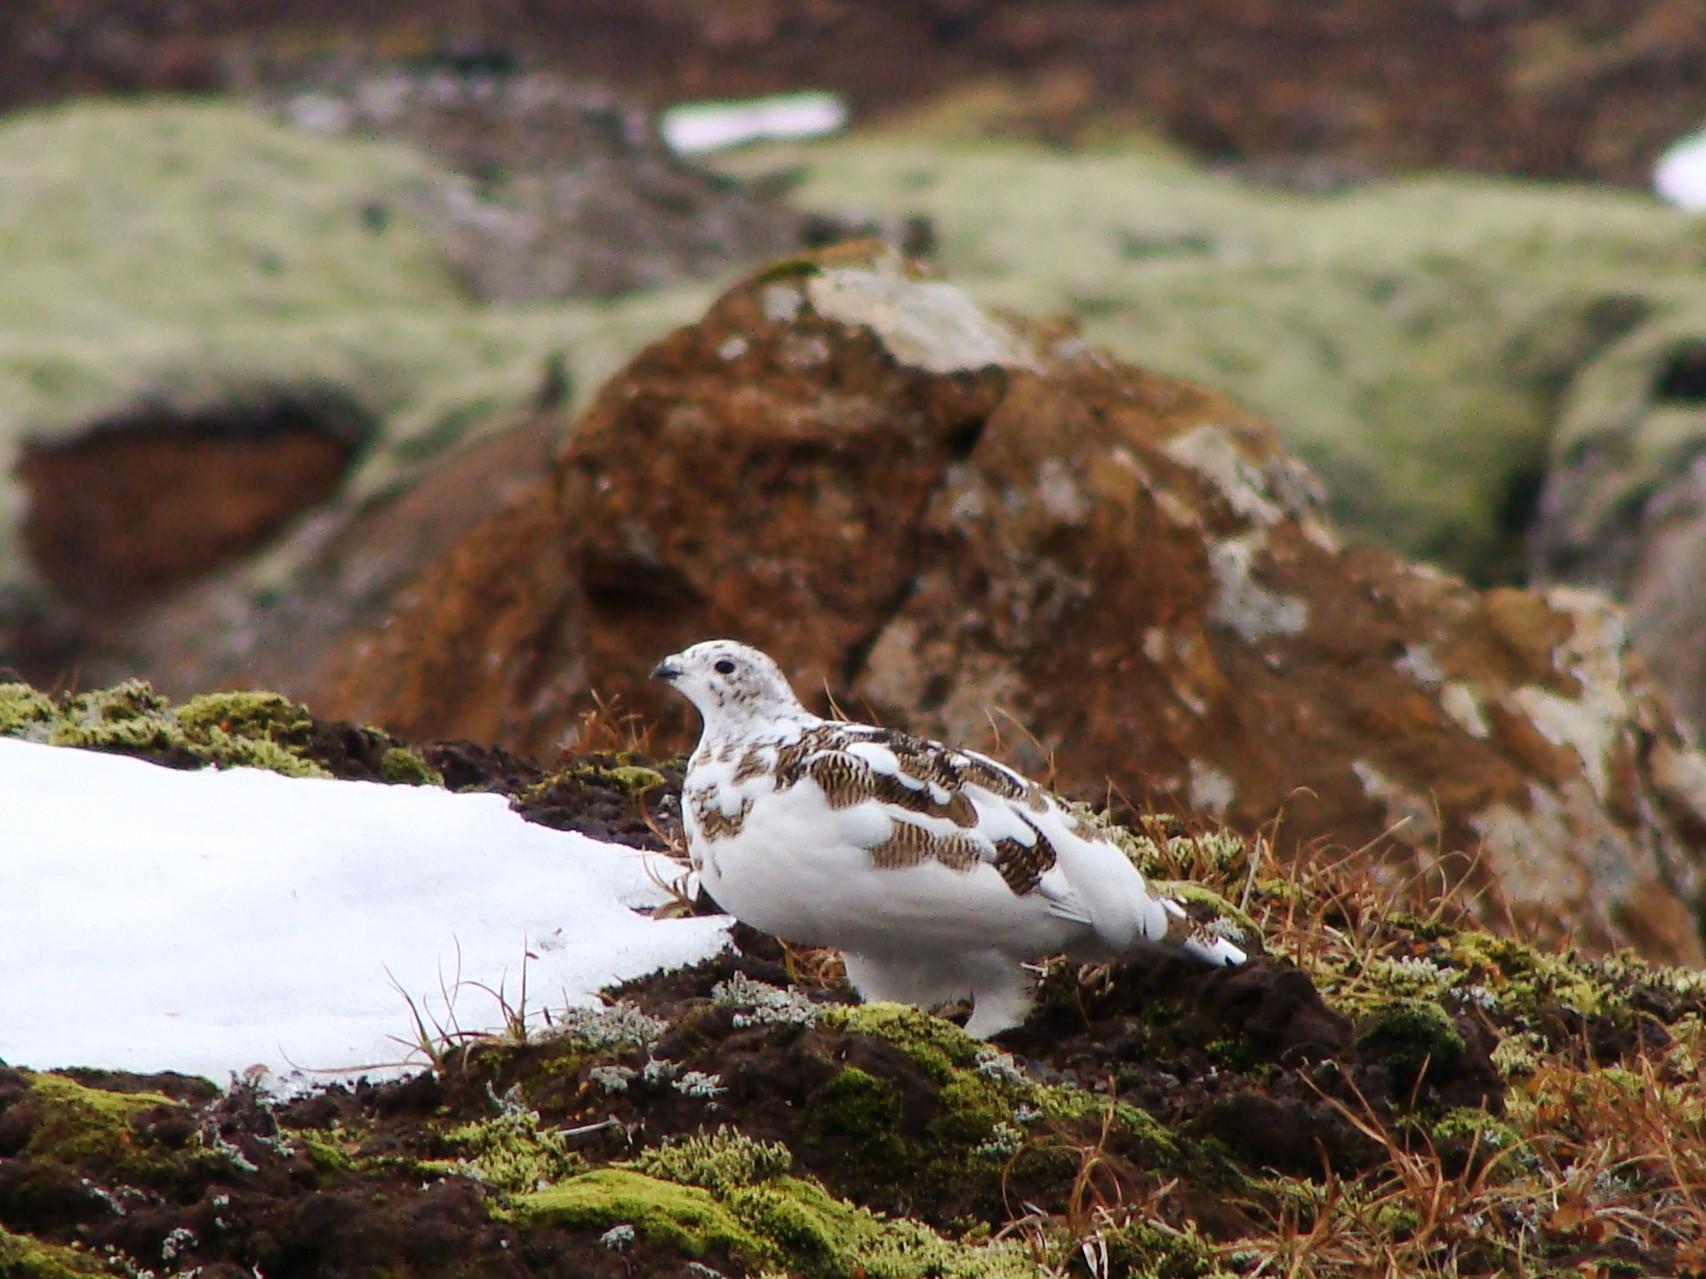 A snow pigeon?